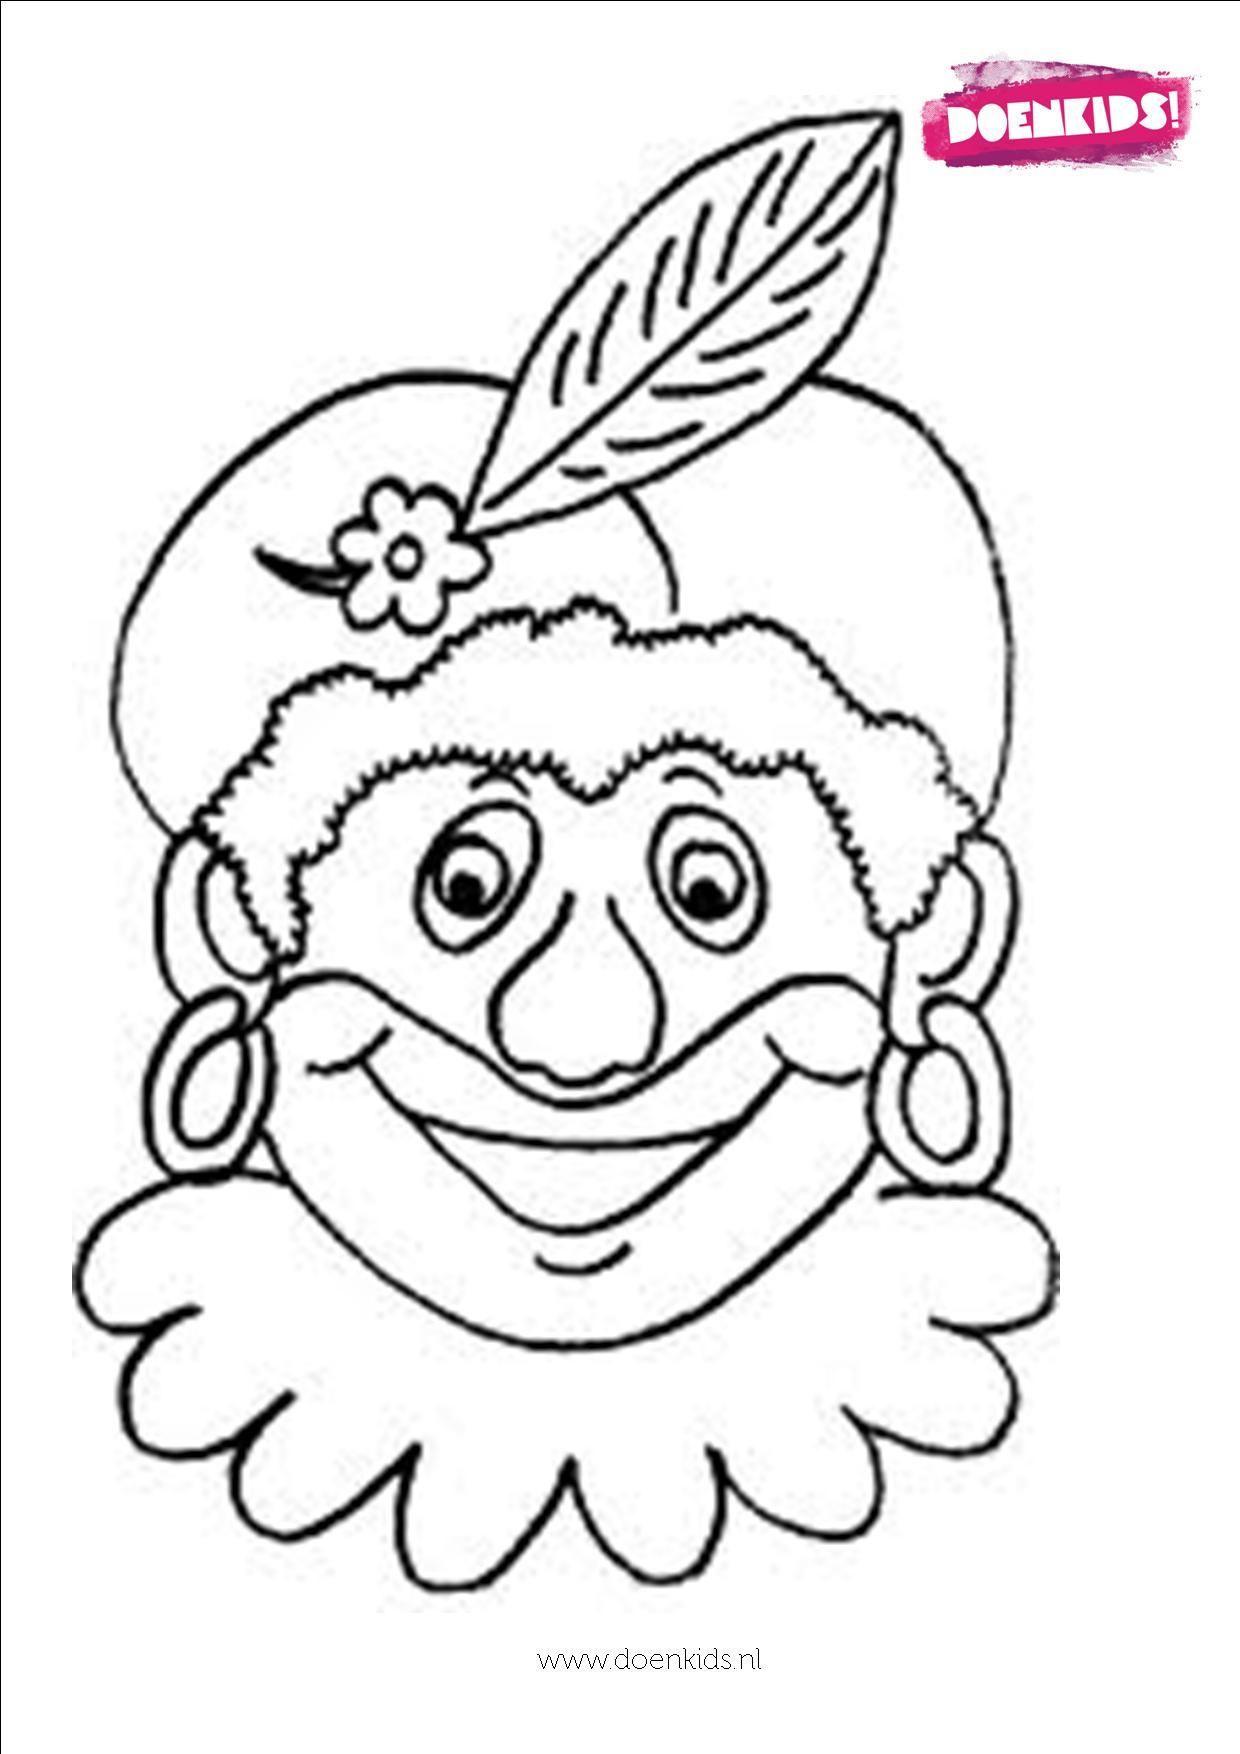 Kleurplaten Maskers Maken.Sint En Piet Masker Maken Www Activitheek Nl Coloring